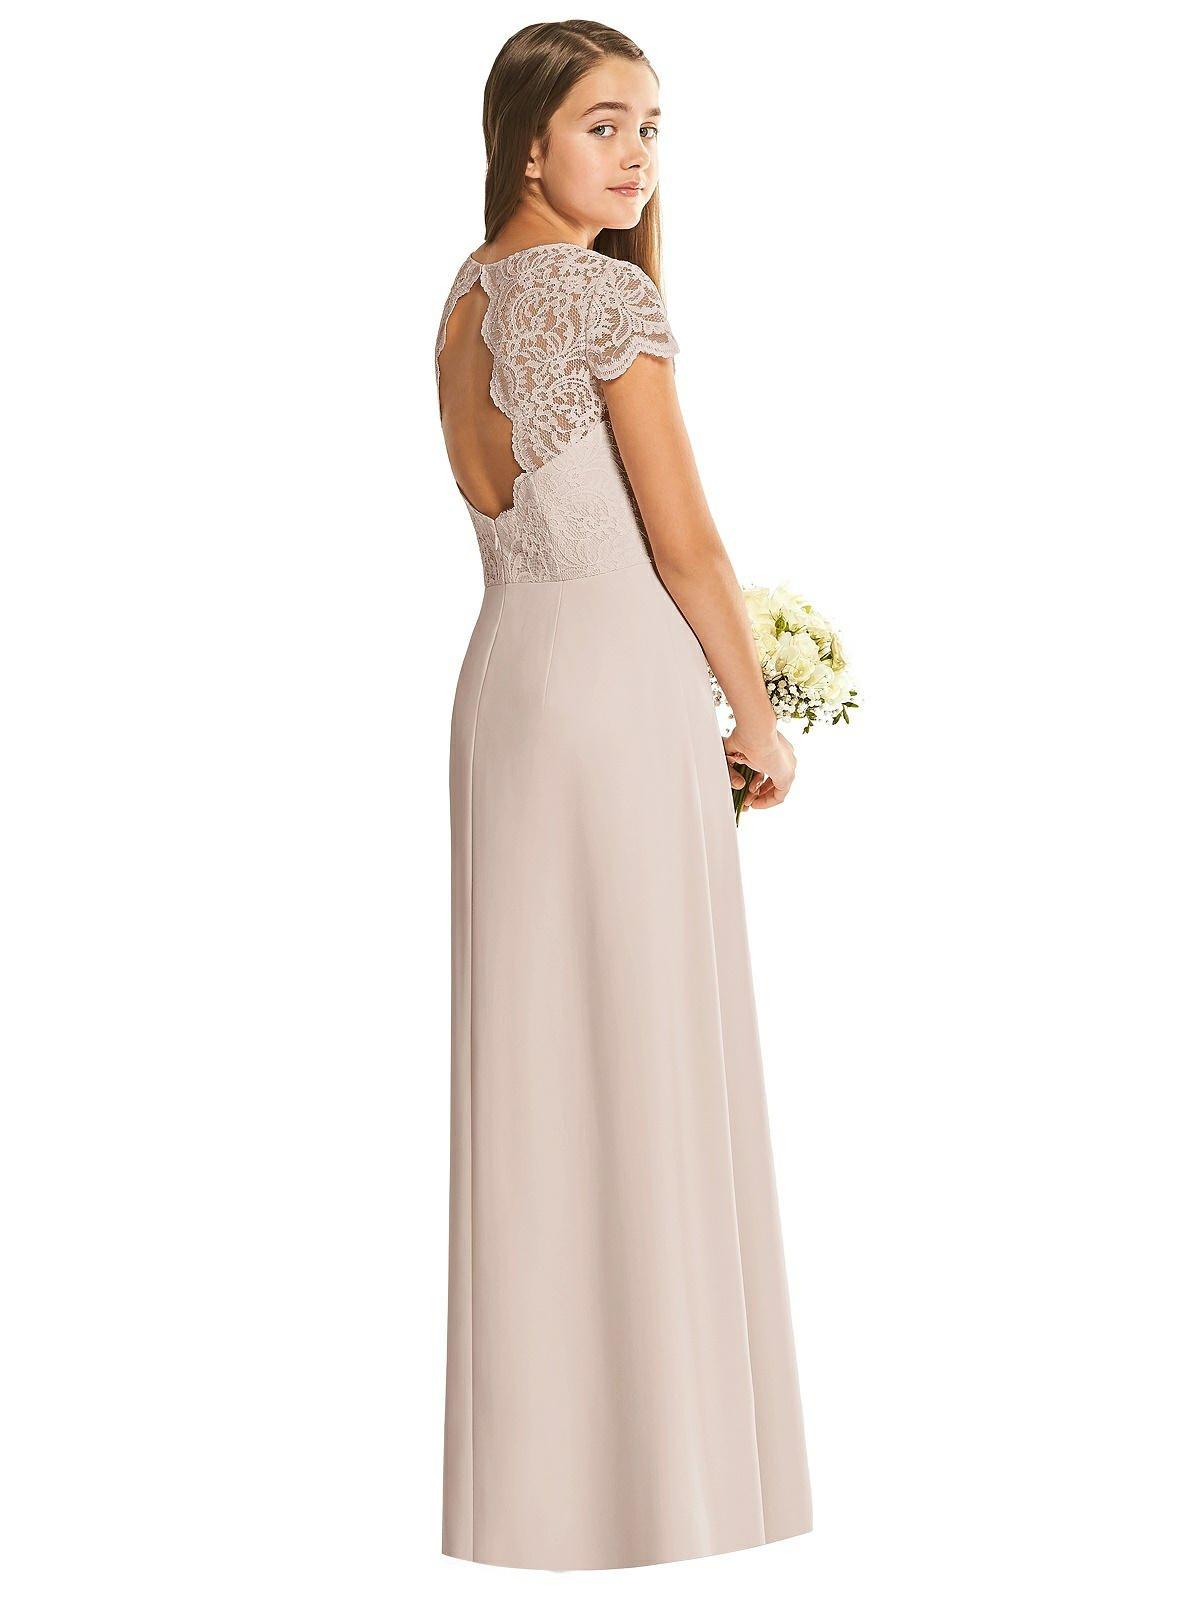 Cameo Marquis Lace Junior Bridesmaids Dress